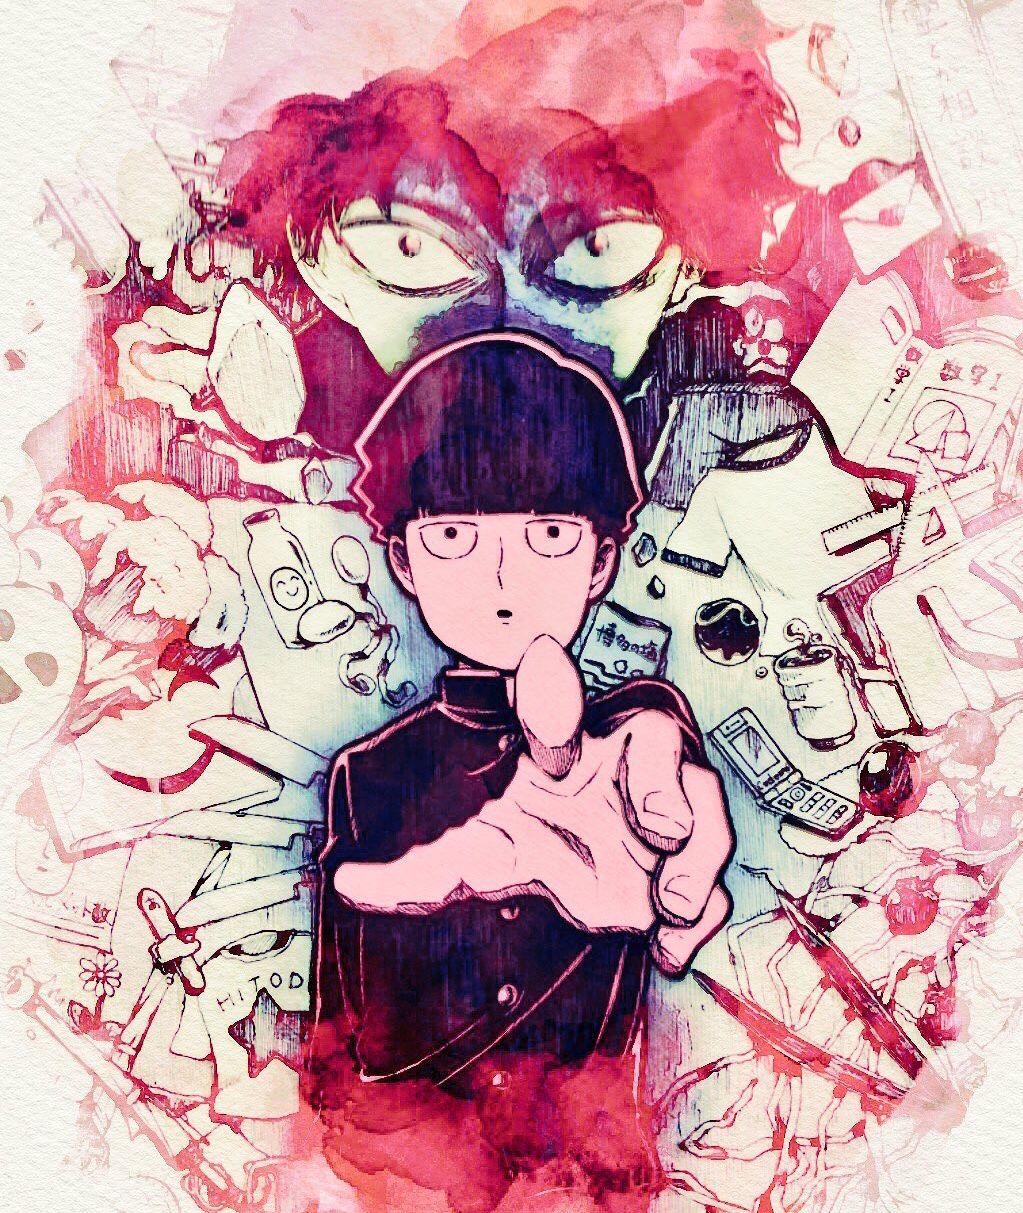 M O B P S Y Image By Mintylilacmelody Mob Psycho 100 Anime